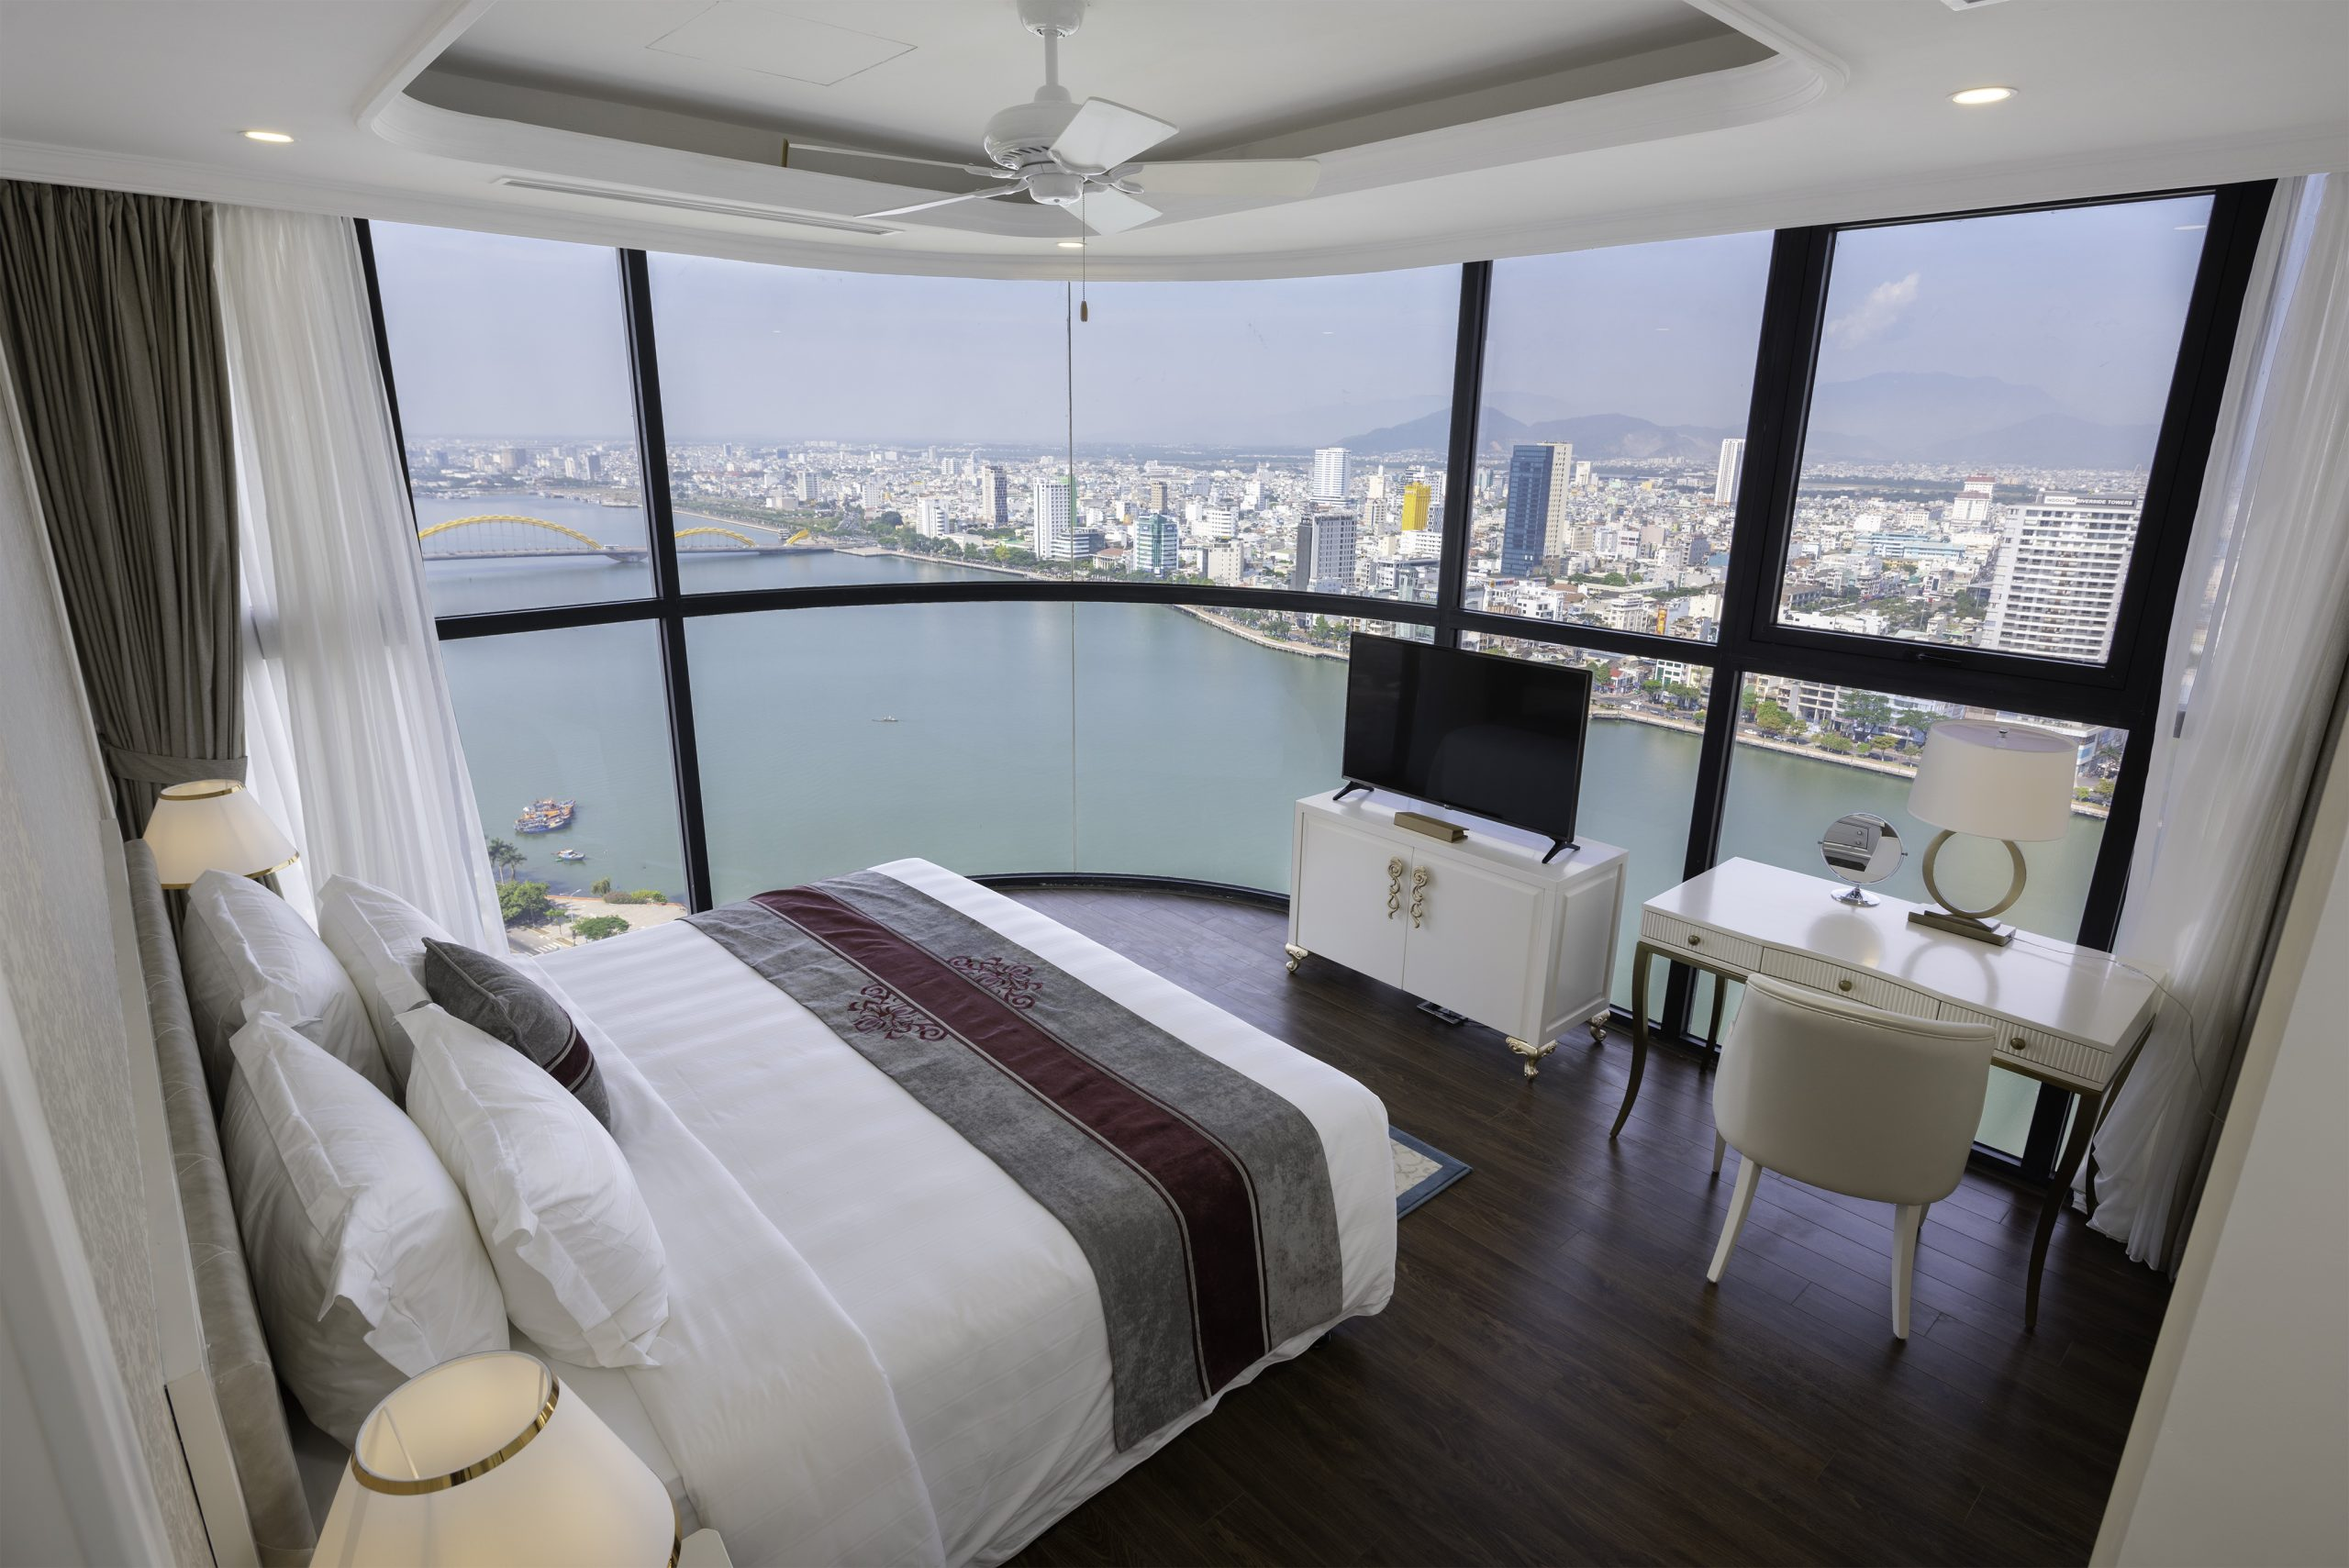 5 Star Apartment For Rent Vinpearl Codotel Riverfront Da Nang